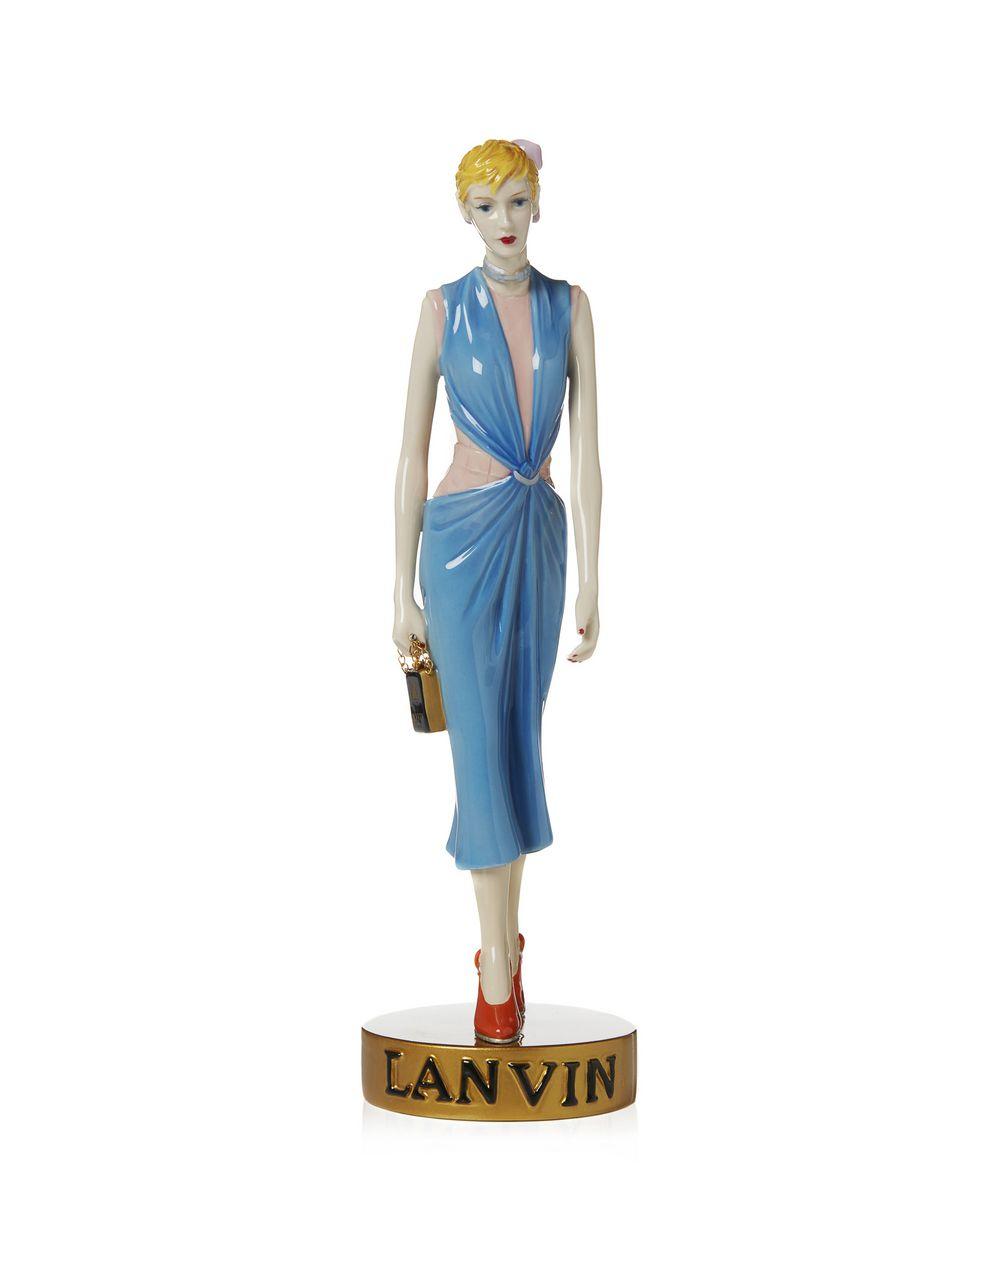 Miss Lanvin 53 - Lanvin